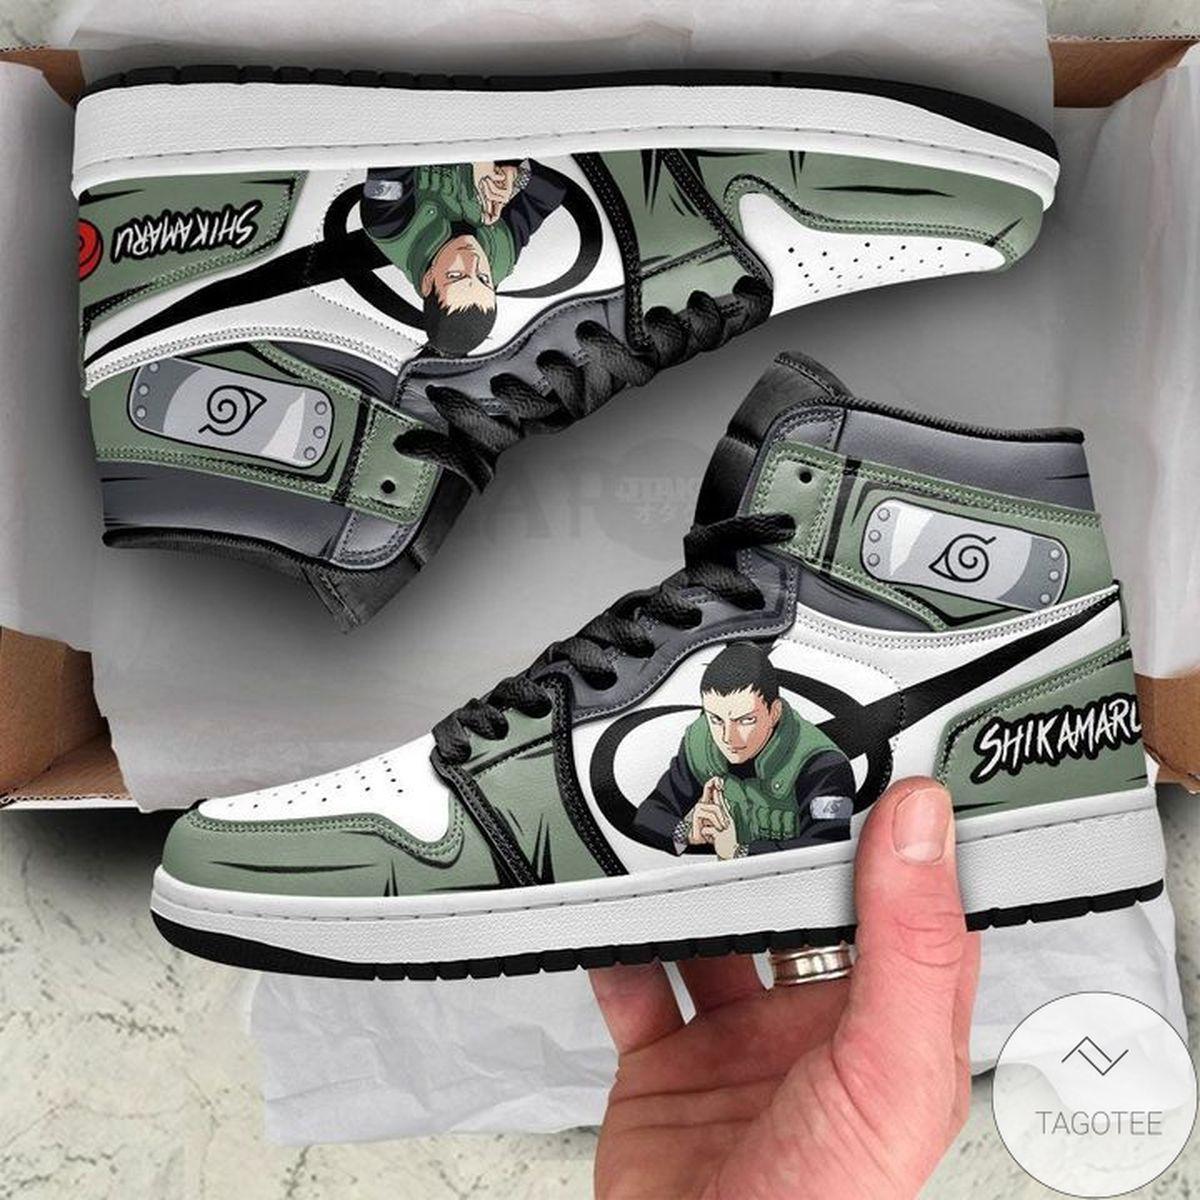 Ships From USA Nara Shikamaru Sneaker Air Jordan High Top Shoes